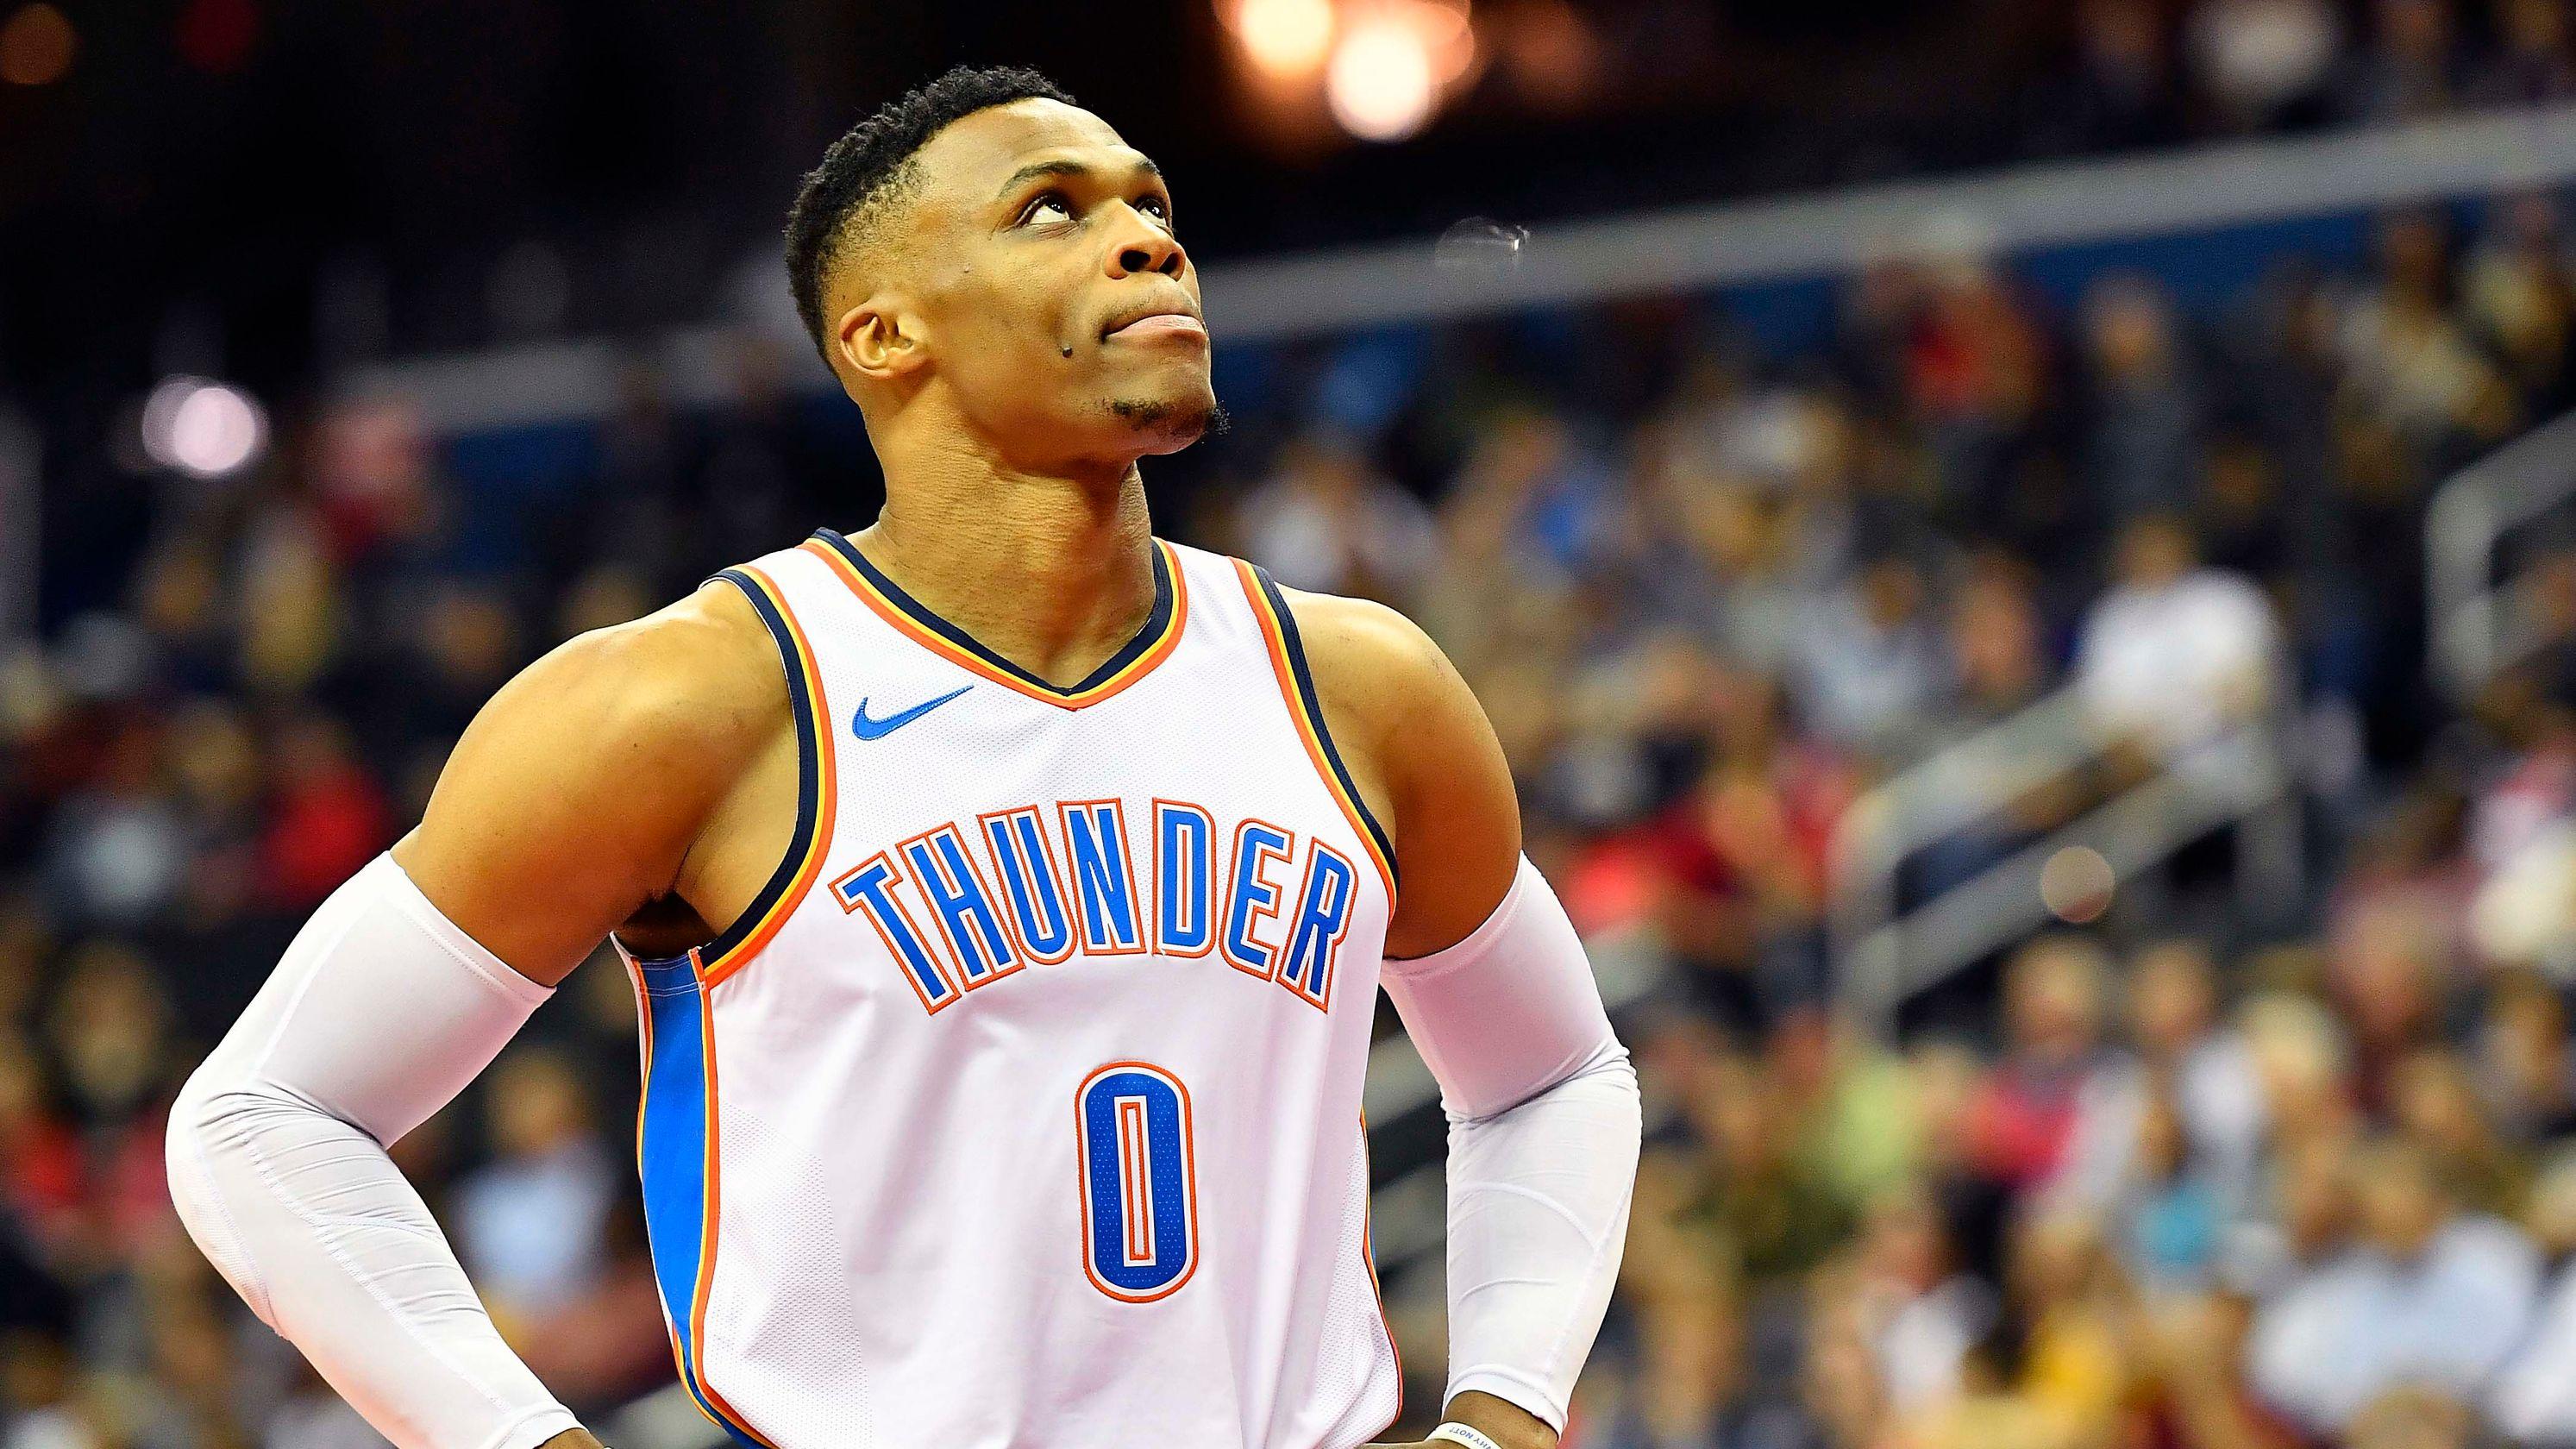 NBA's wild, wild West overpowering East: 'It's not even close'